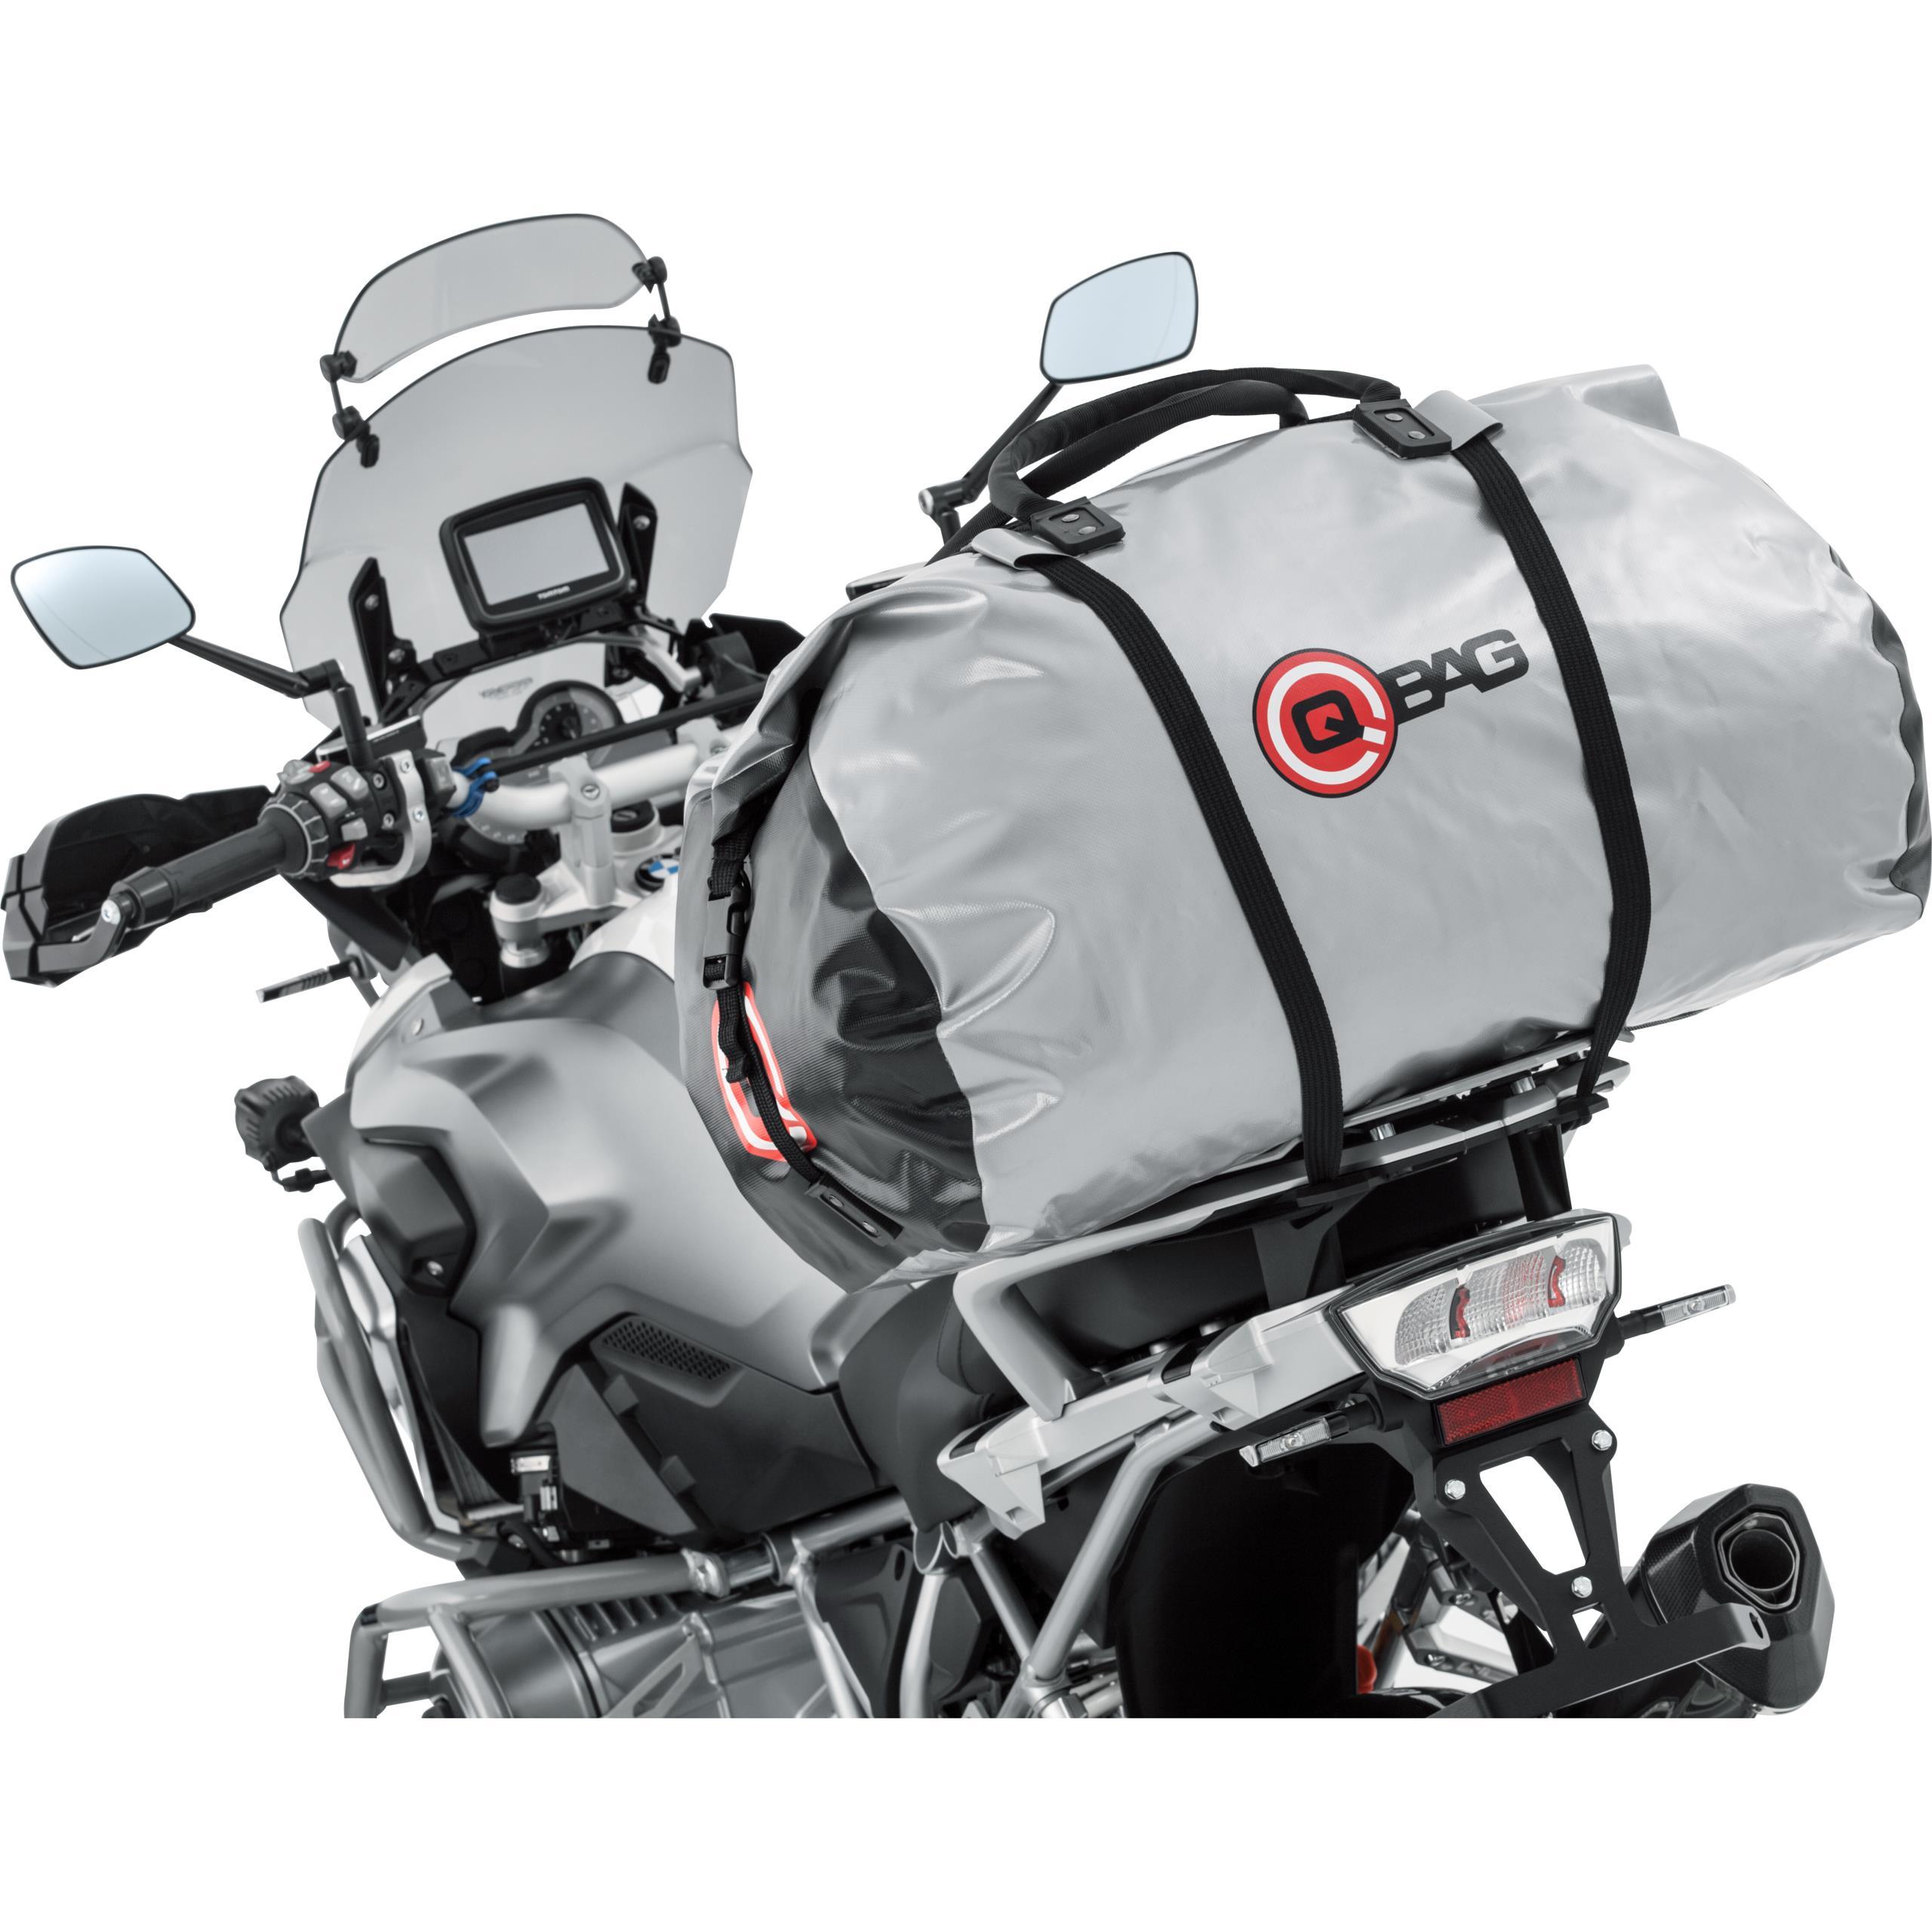 <br /><br /><b>Artikel: </b>Qbag Gepäckrolle Silber 76 Liter